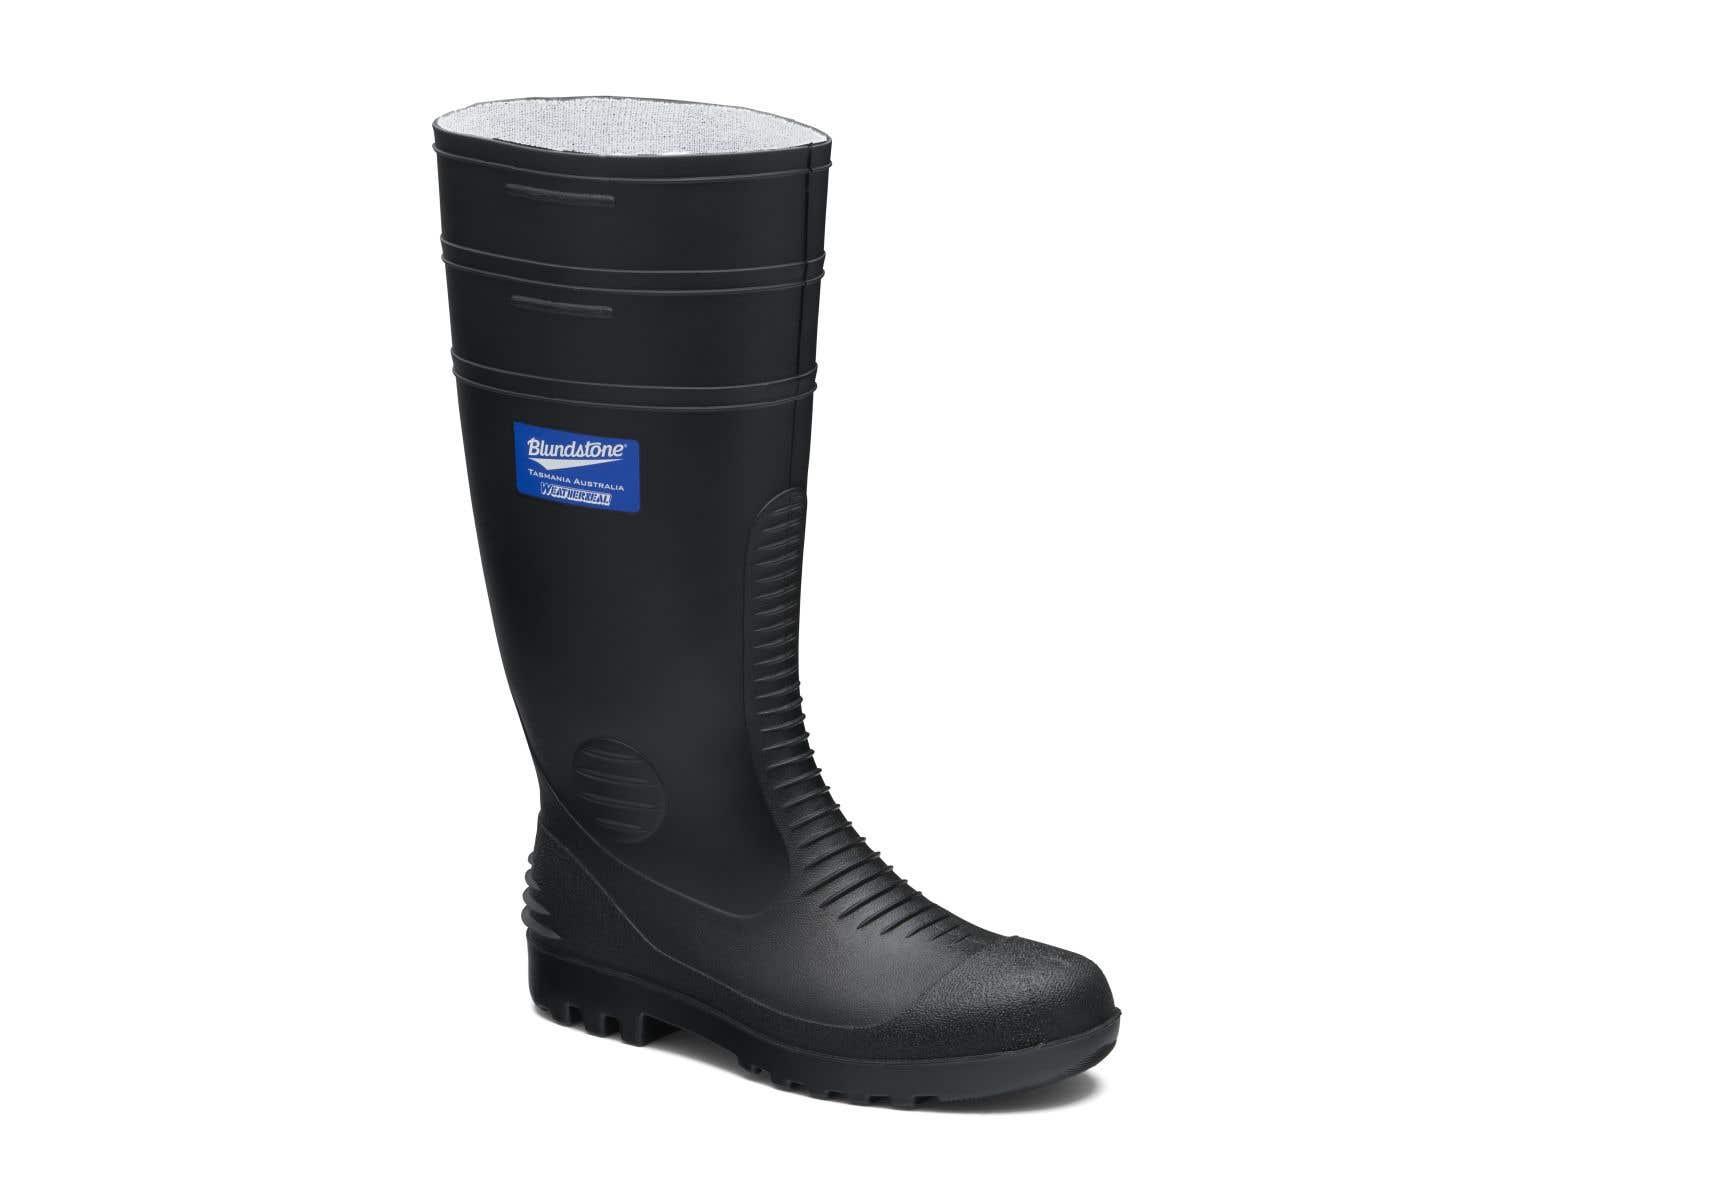 Blundstone Waterproof Non-Safety